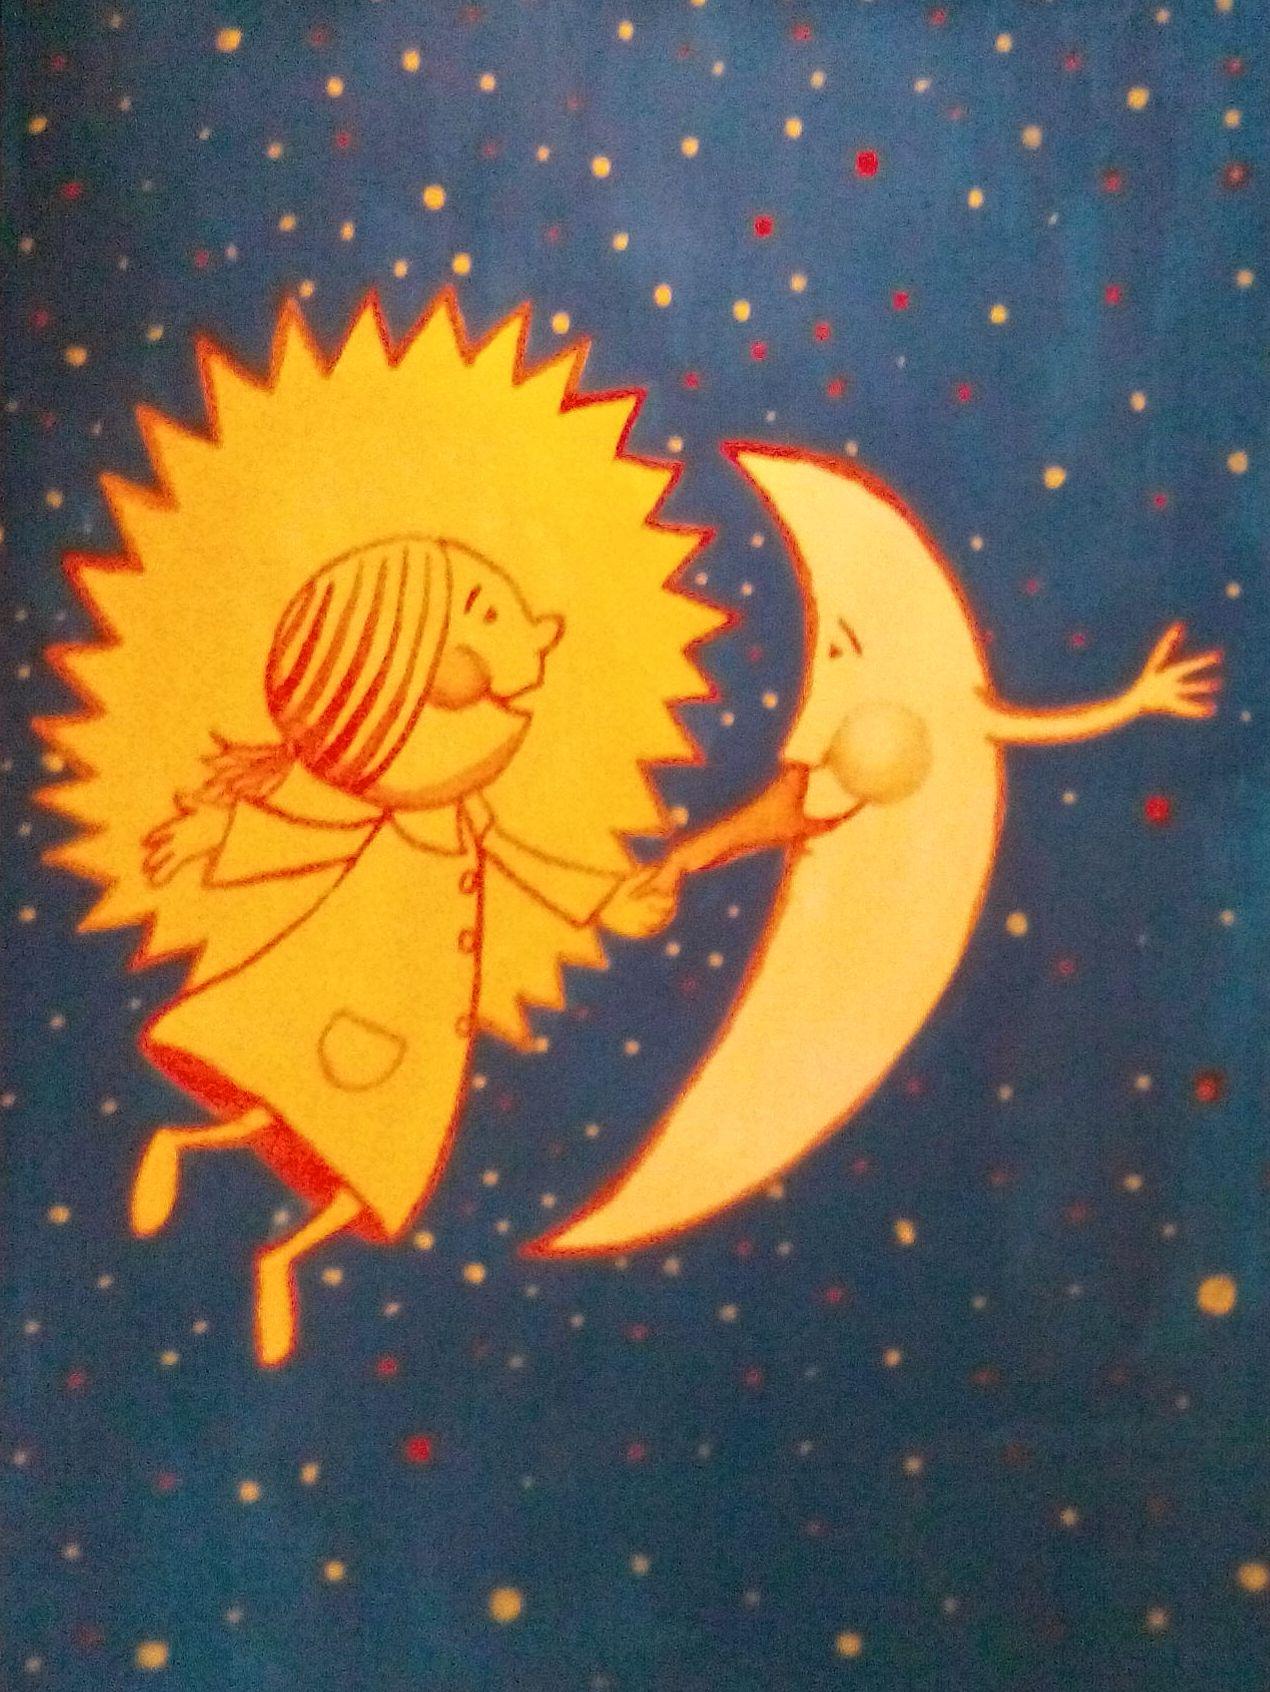 Artwork from the book - Откраднатата луна by Nikolai Georgiev - Ourboox.com